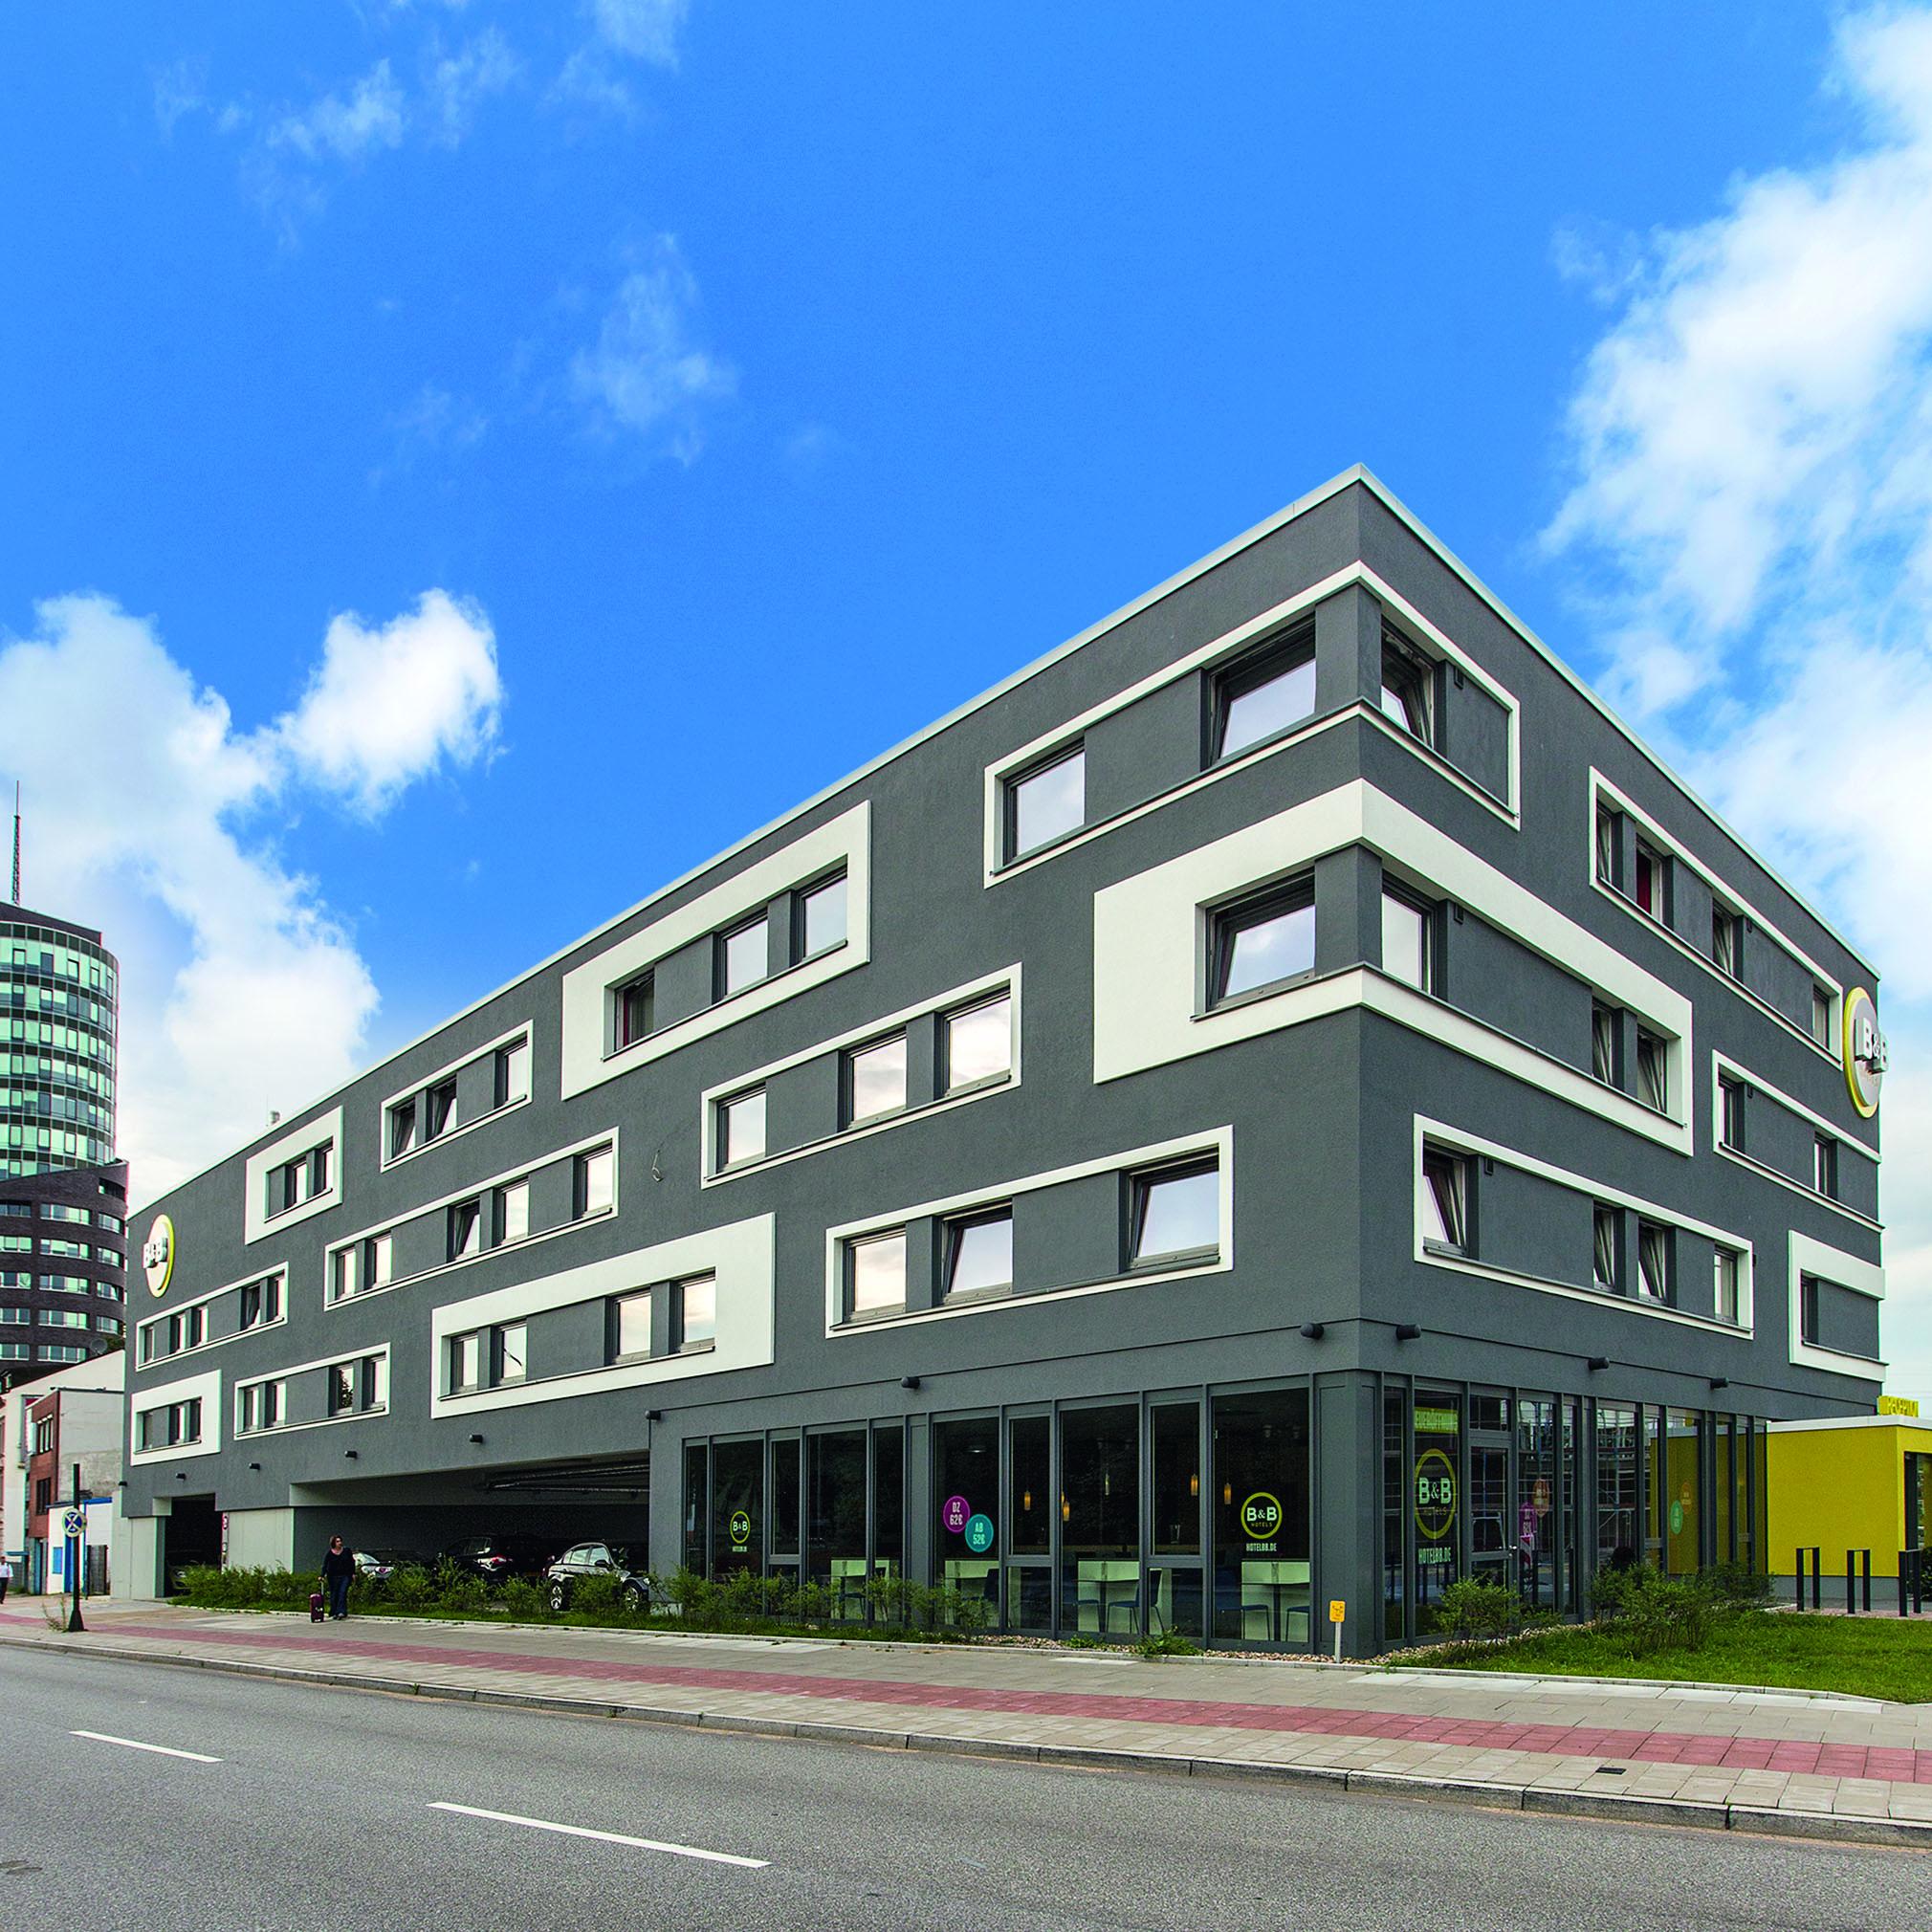 100 neue hotelzimmer in nur 8 monaten data pool k ster gmbh. Black Bedroom Furniture Sets. Home Design Ideas